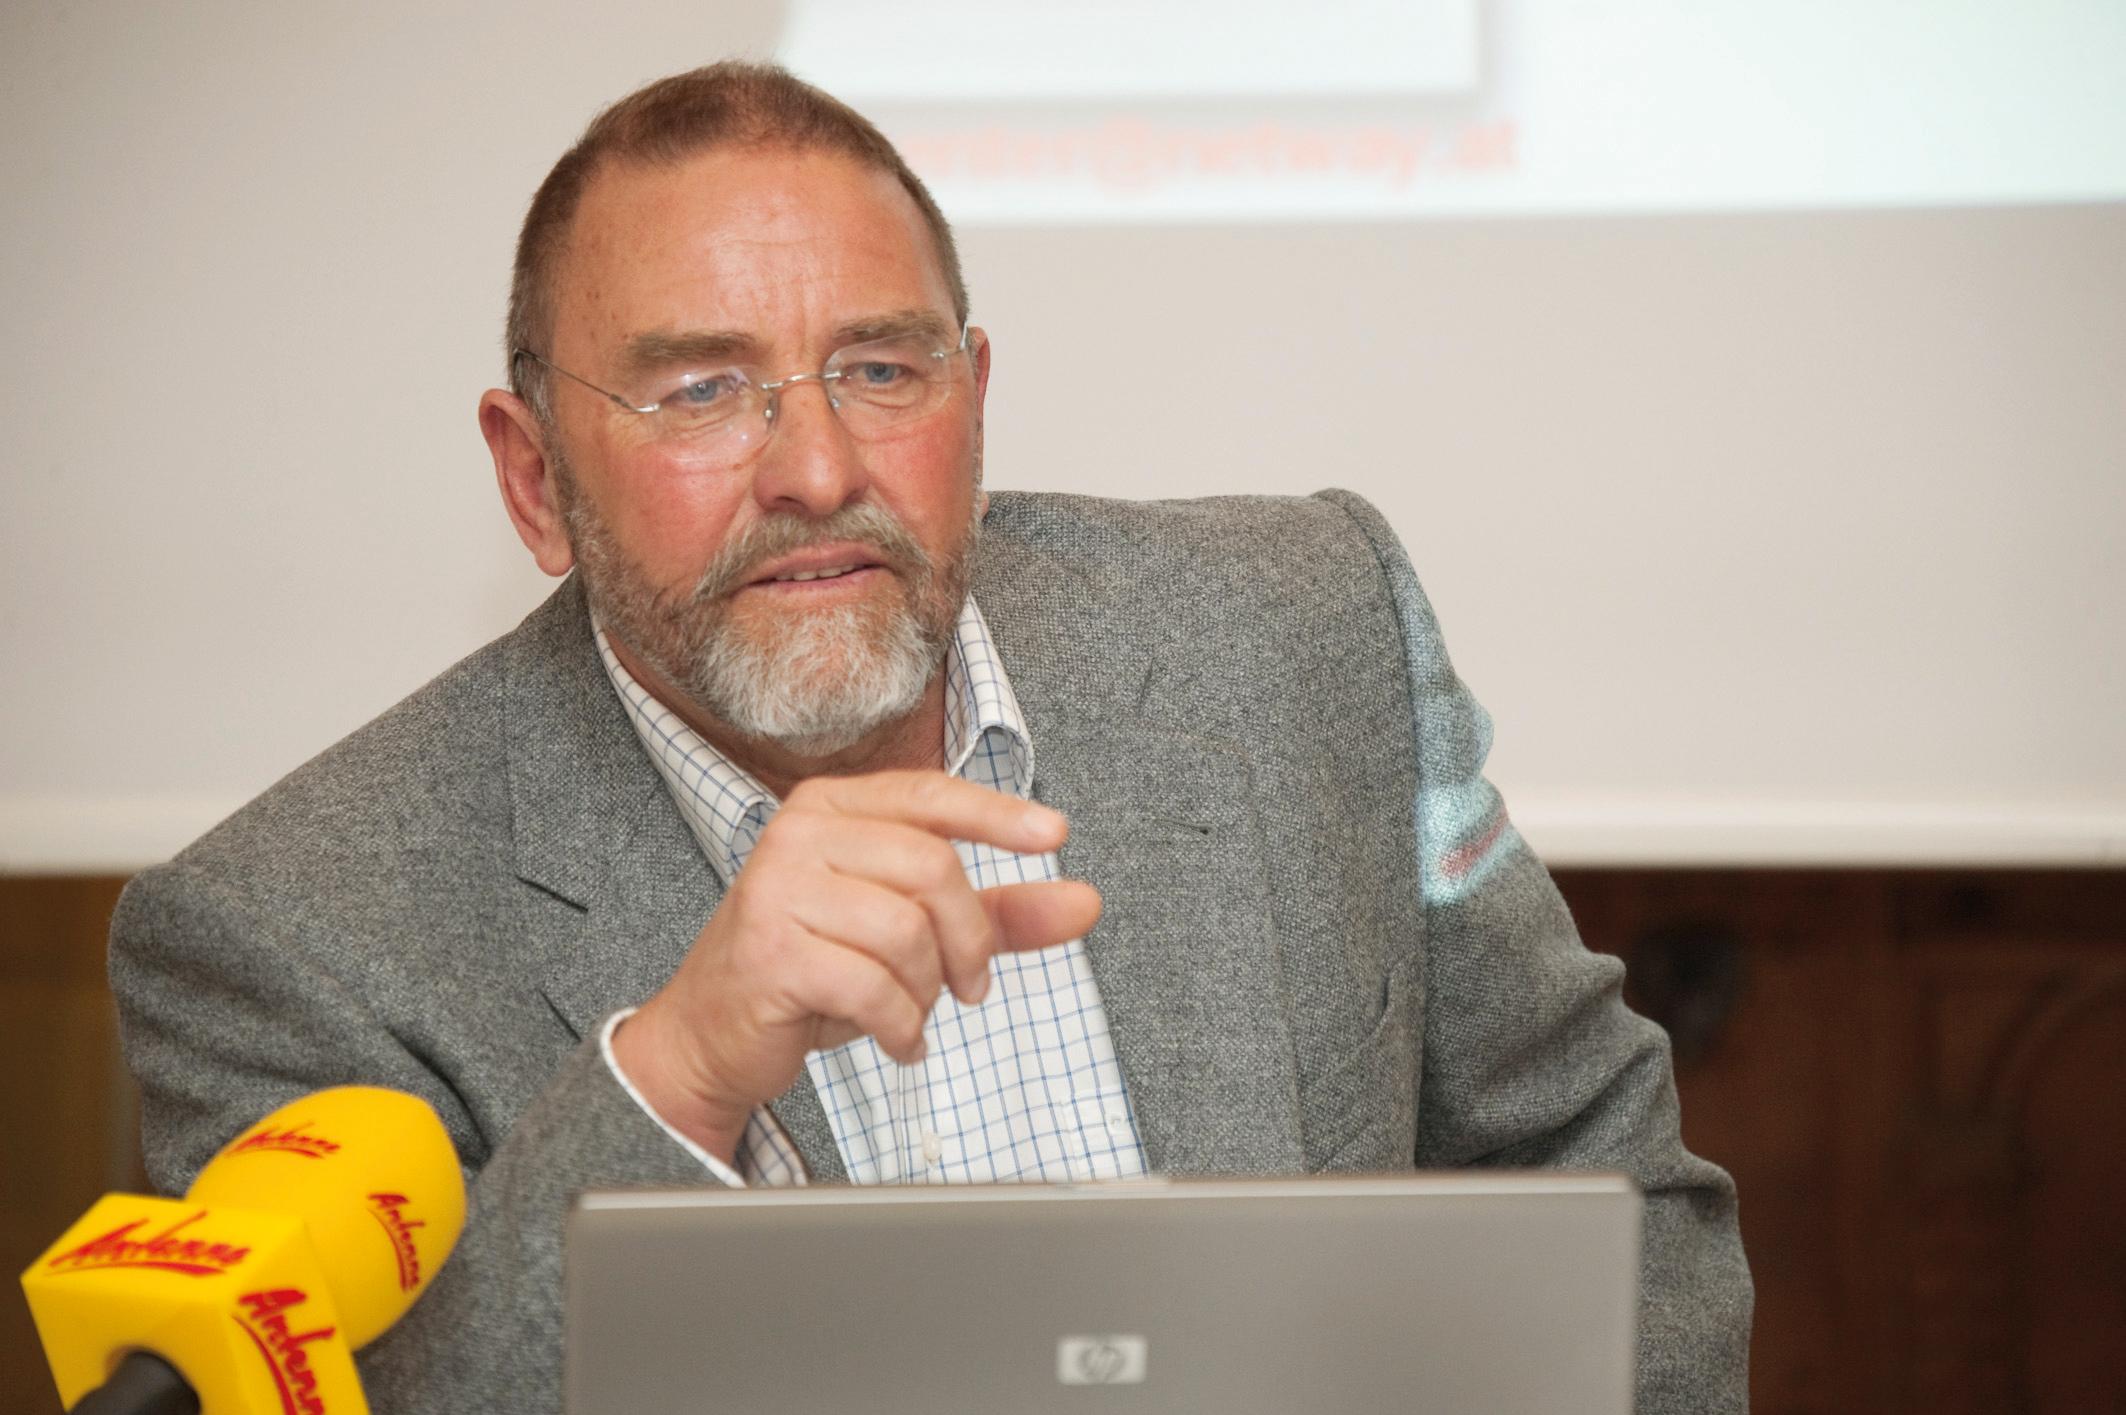 Univ. Prof. Sepp Porta